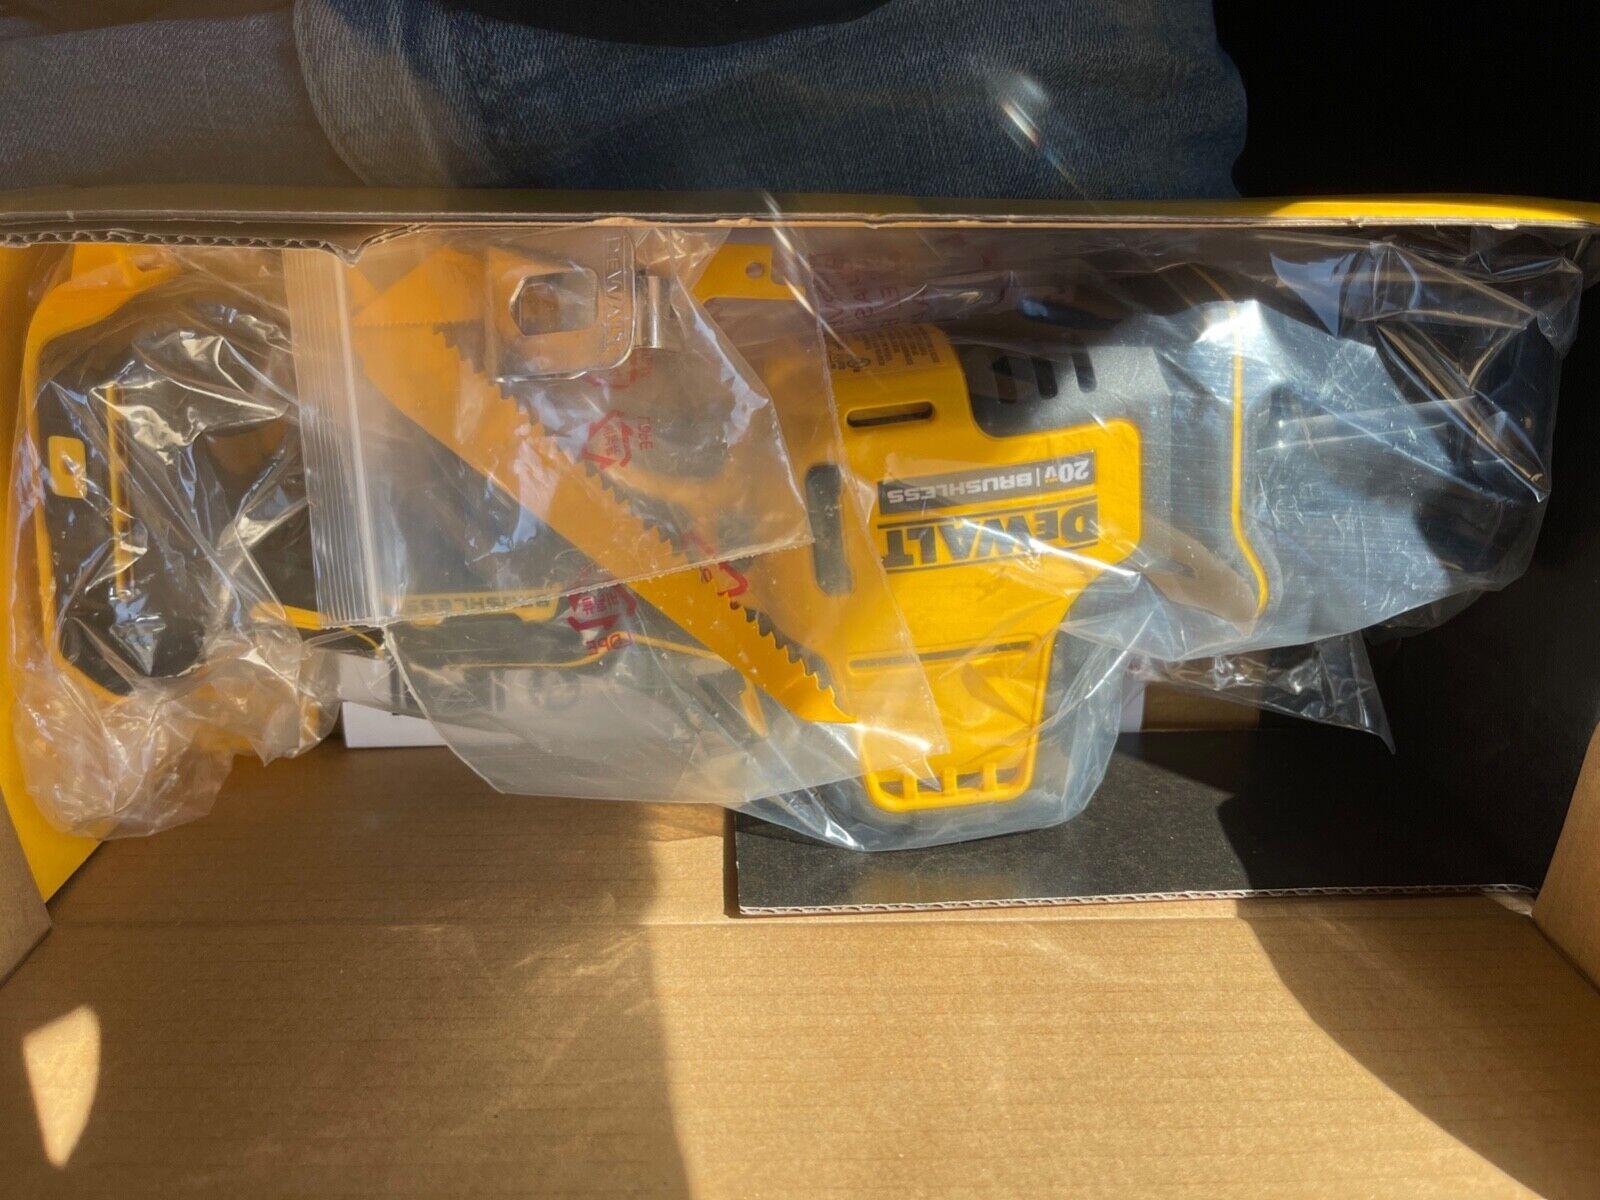 DEWALT DCS369B Atomic 20V Cordless Reciprocating Saw - $99.00